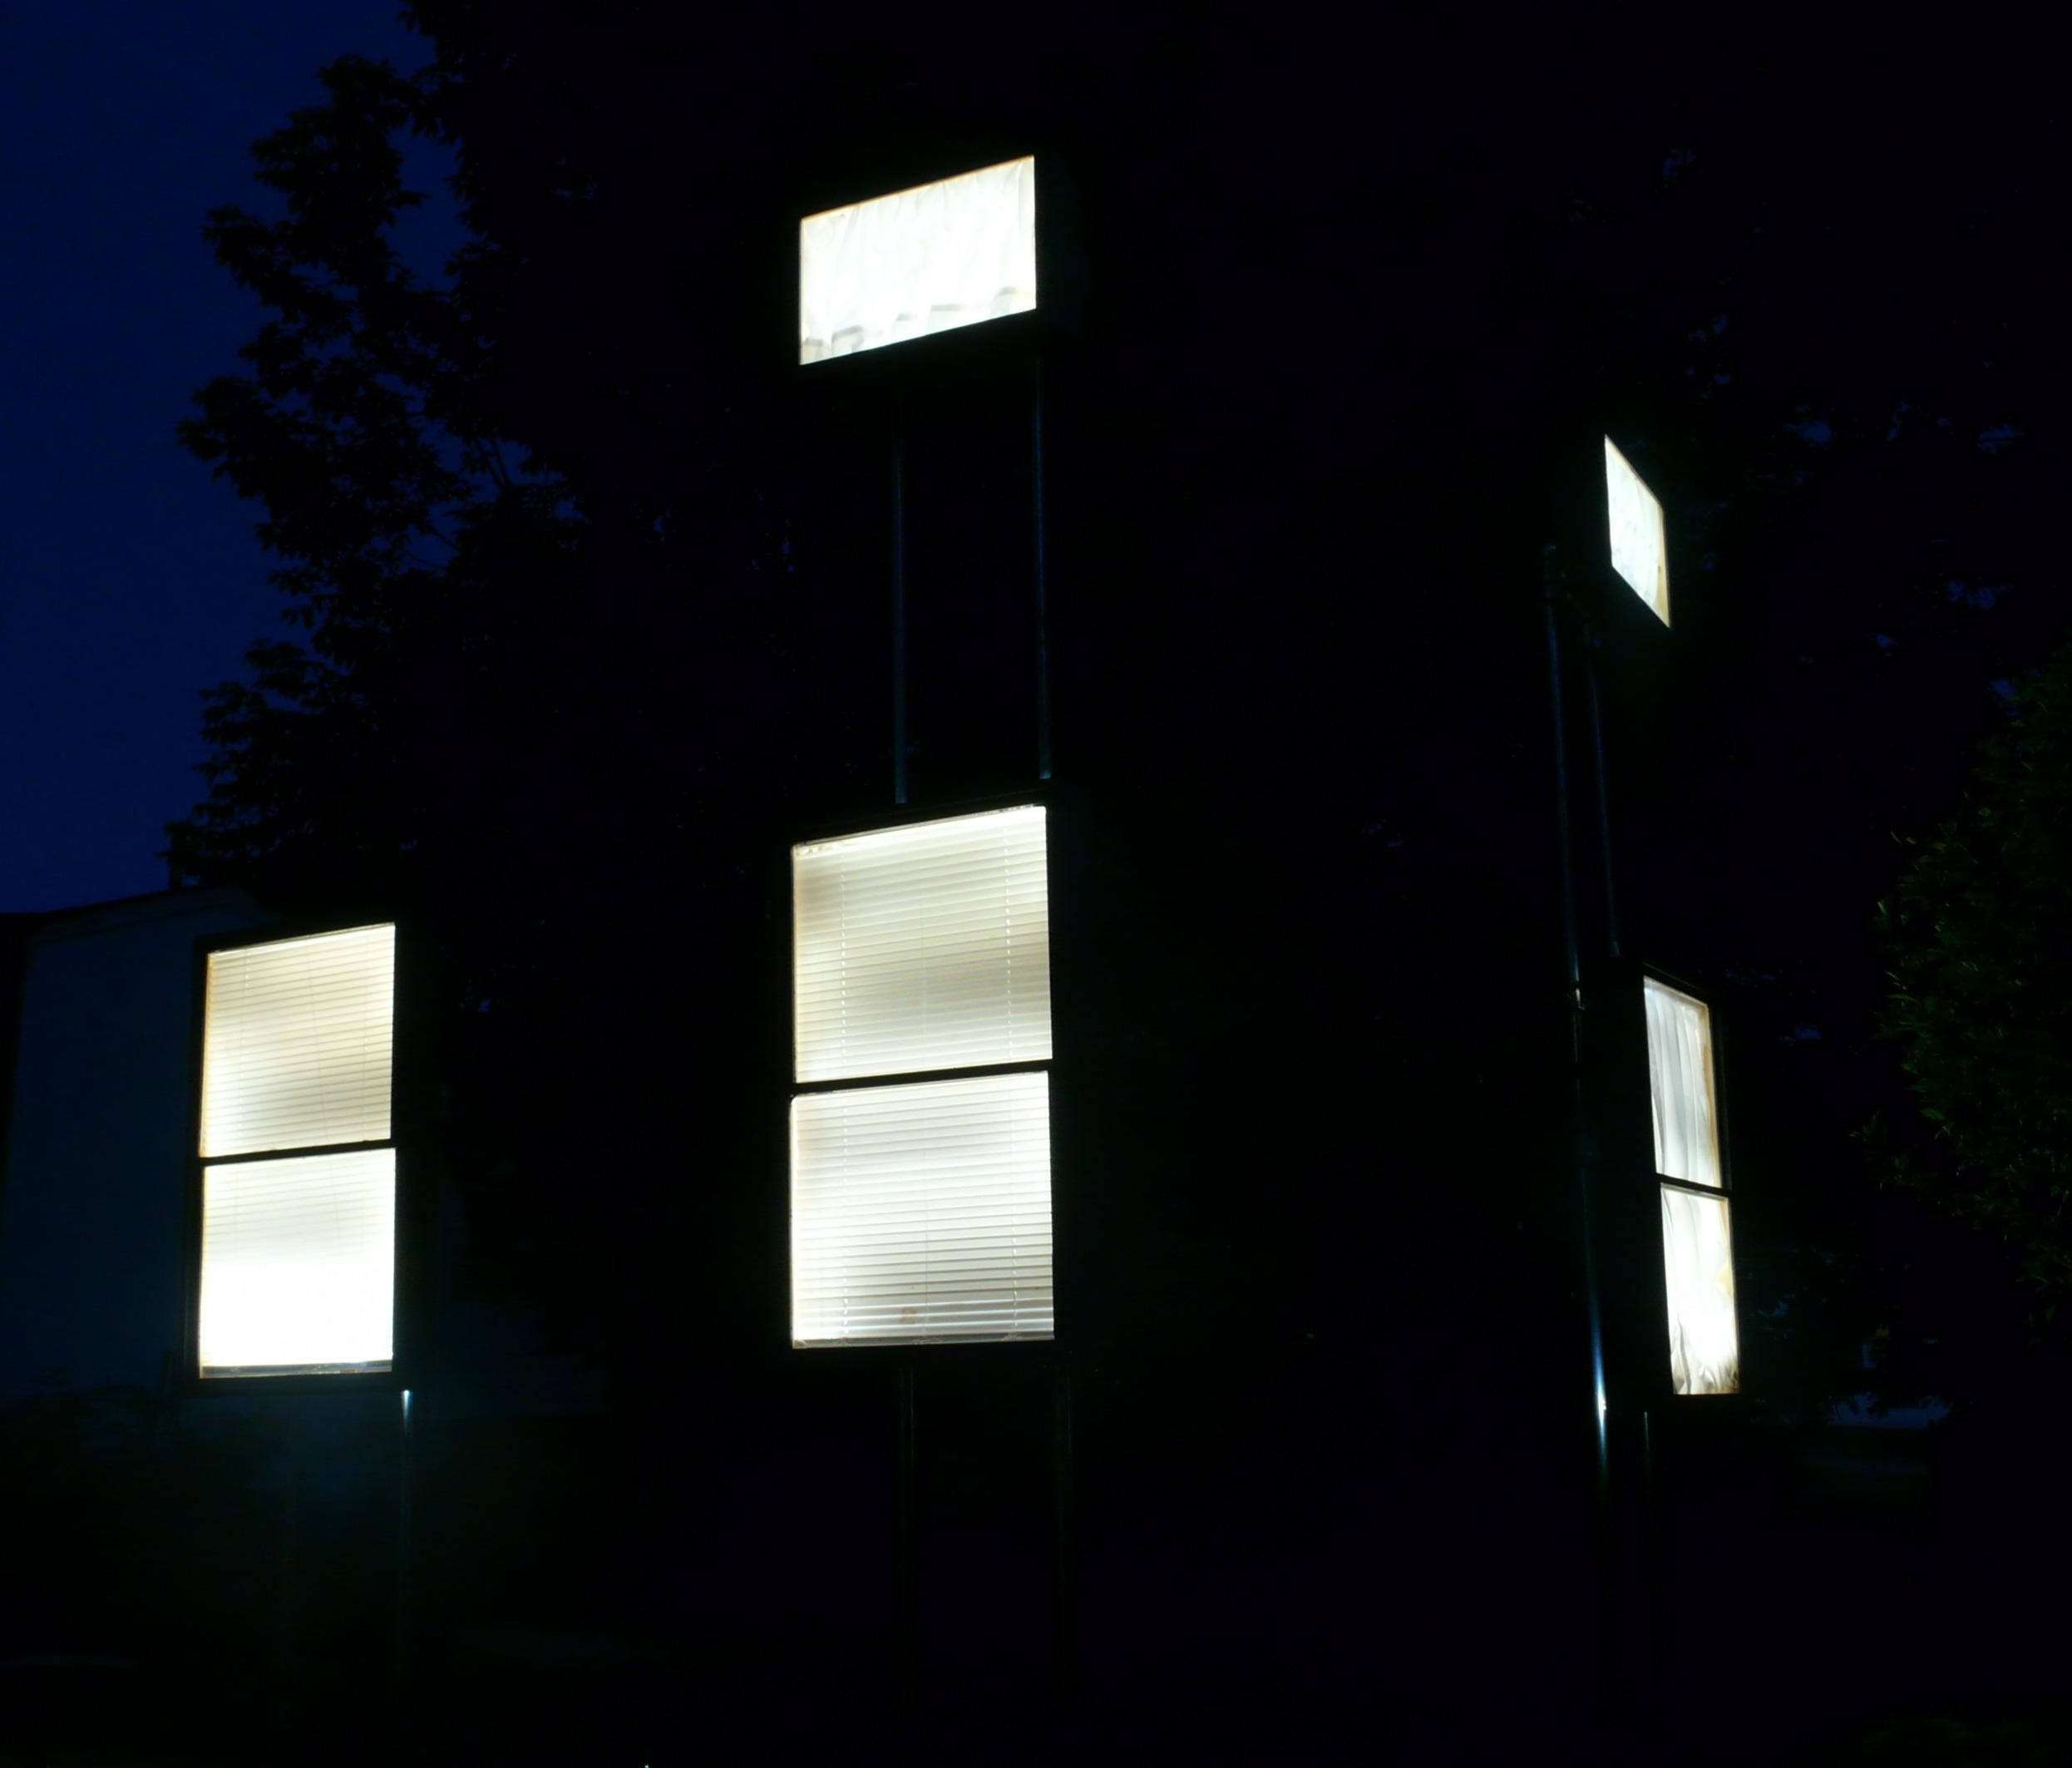 House at Night Single Window